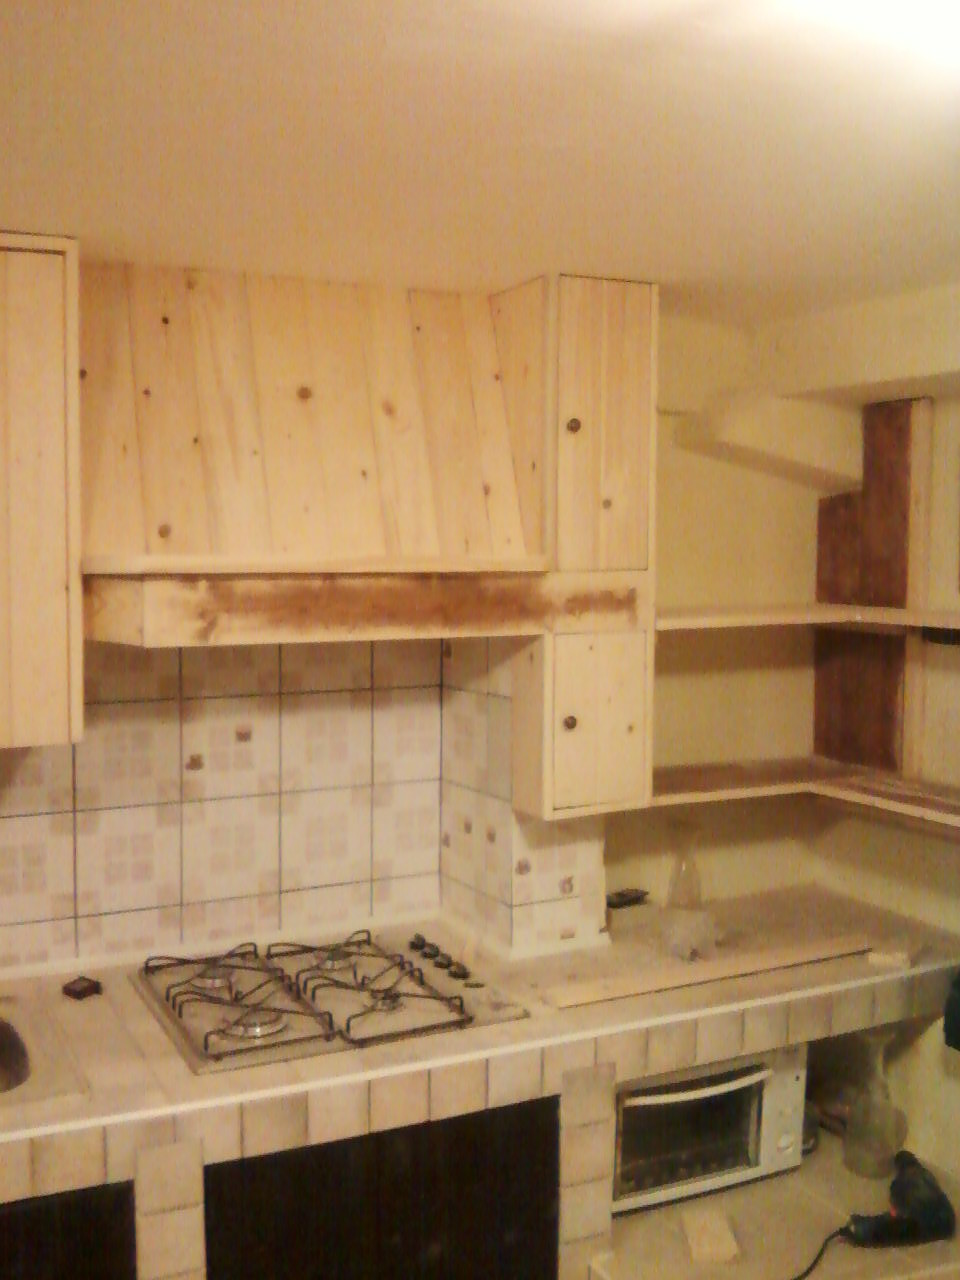 Mie soluzioni pensili per cucina in muratura - Cucine leroy merlin opinioni ...